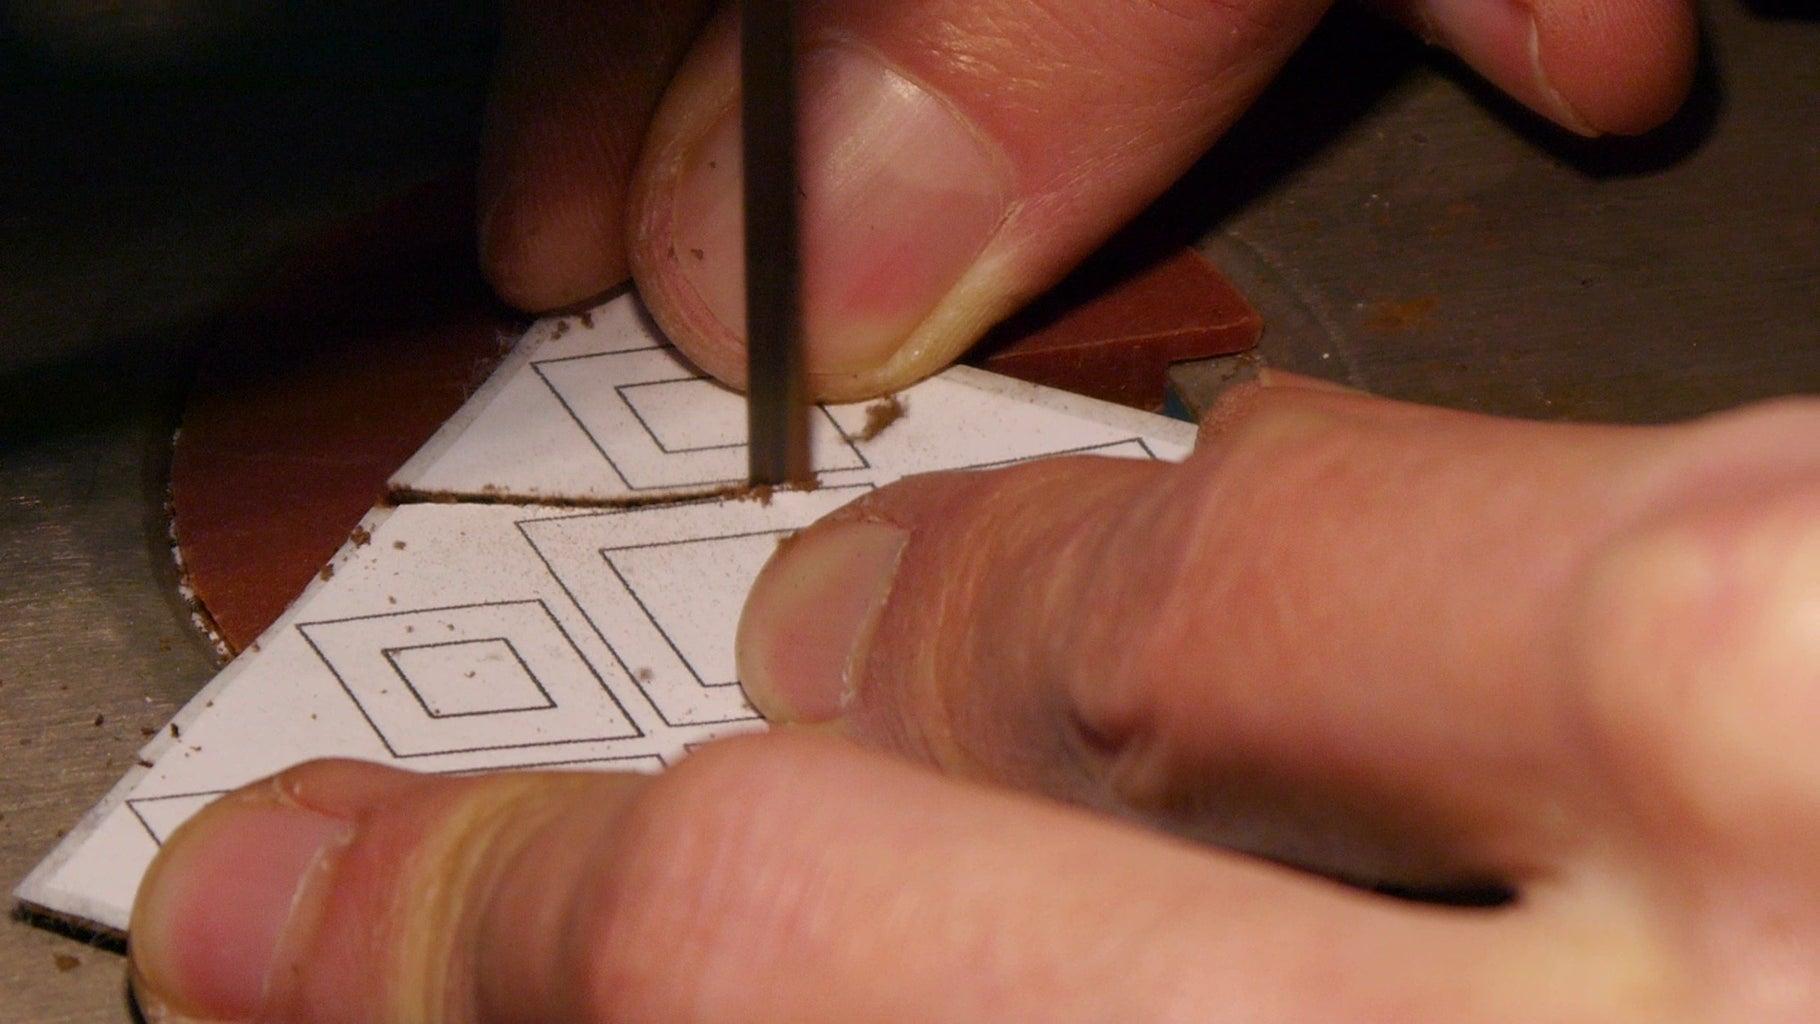 Cutting the Shape